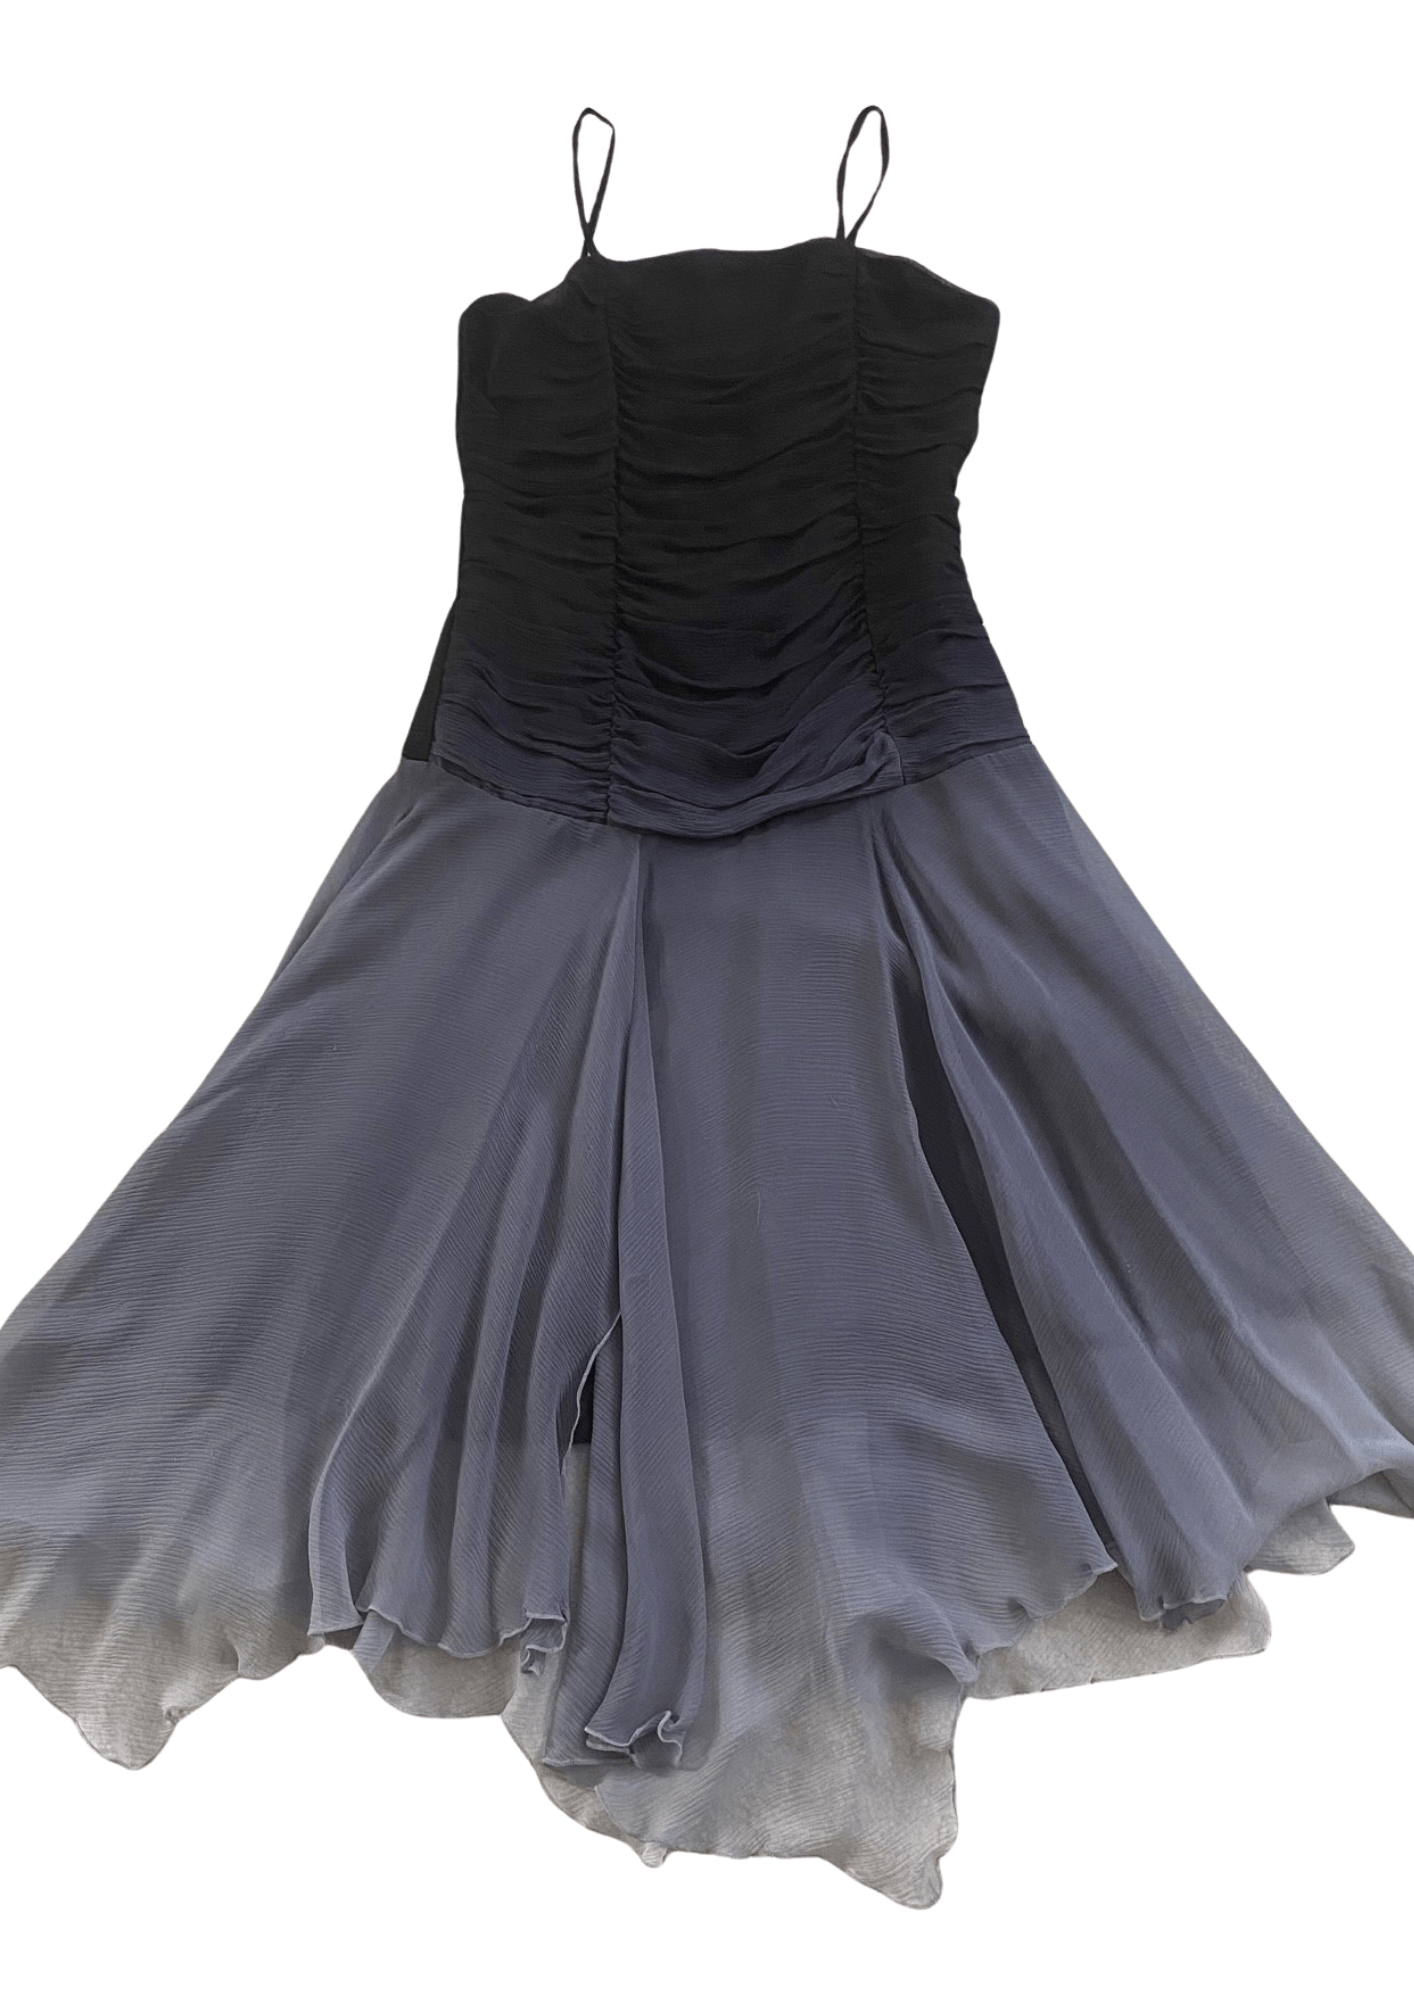 Pre-Loved MW chiffon party dress Age 12 Kind Shop